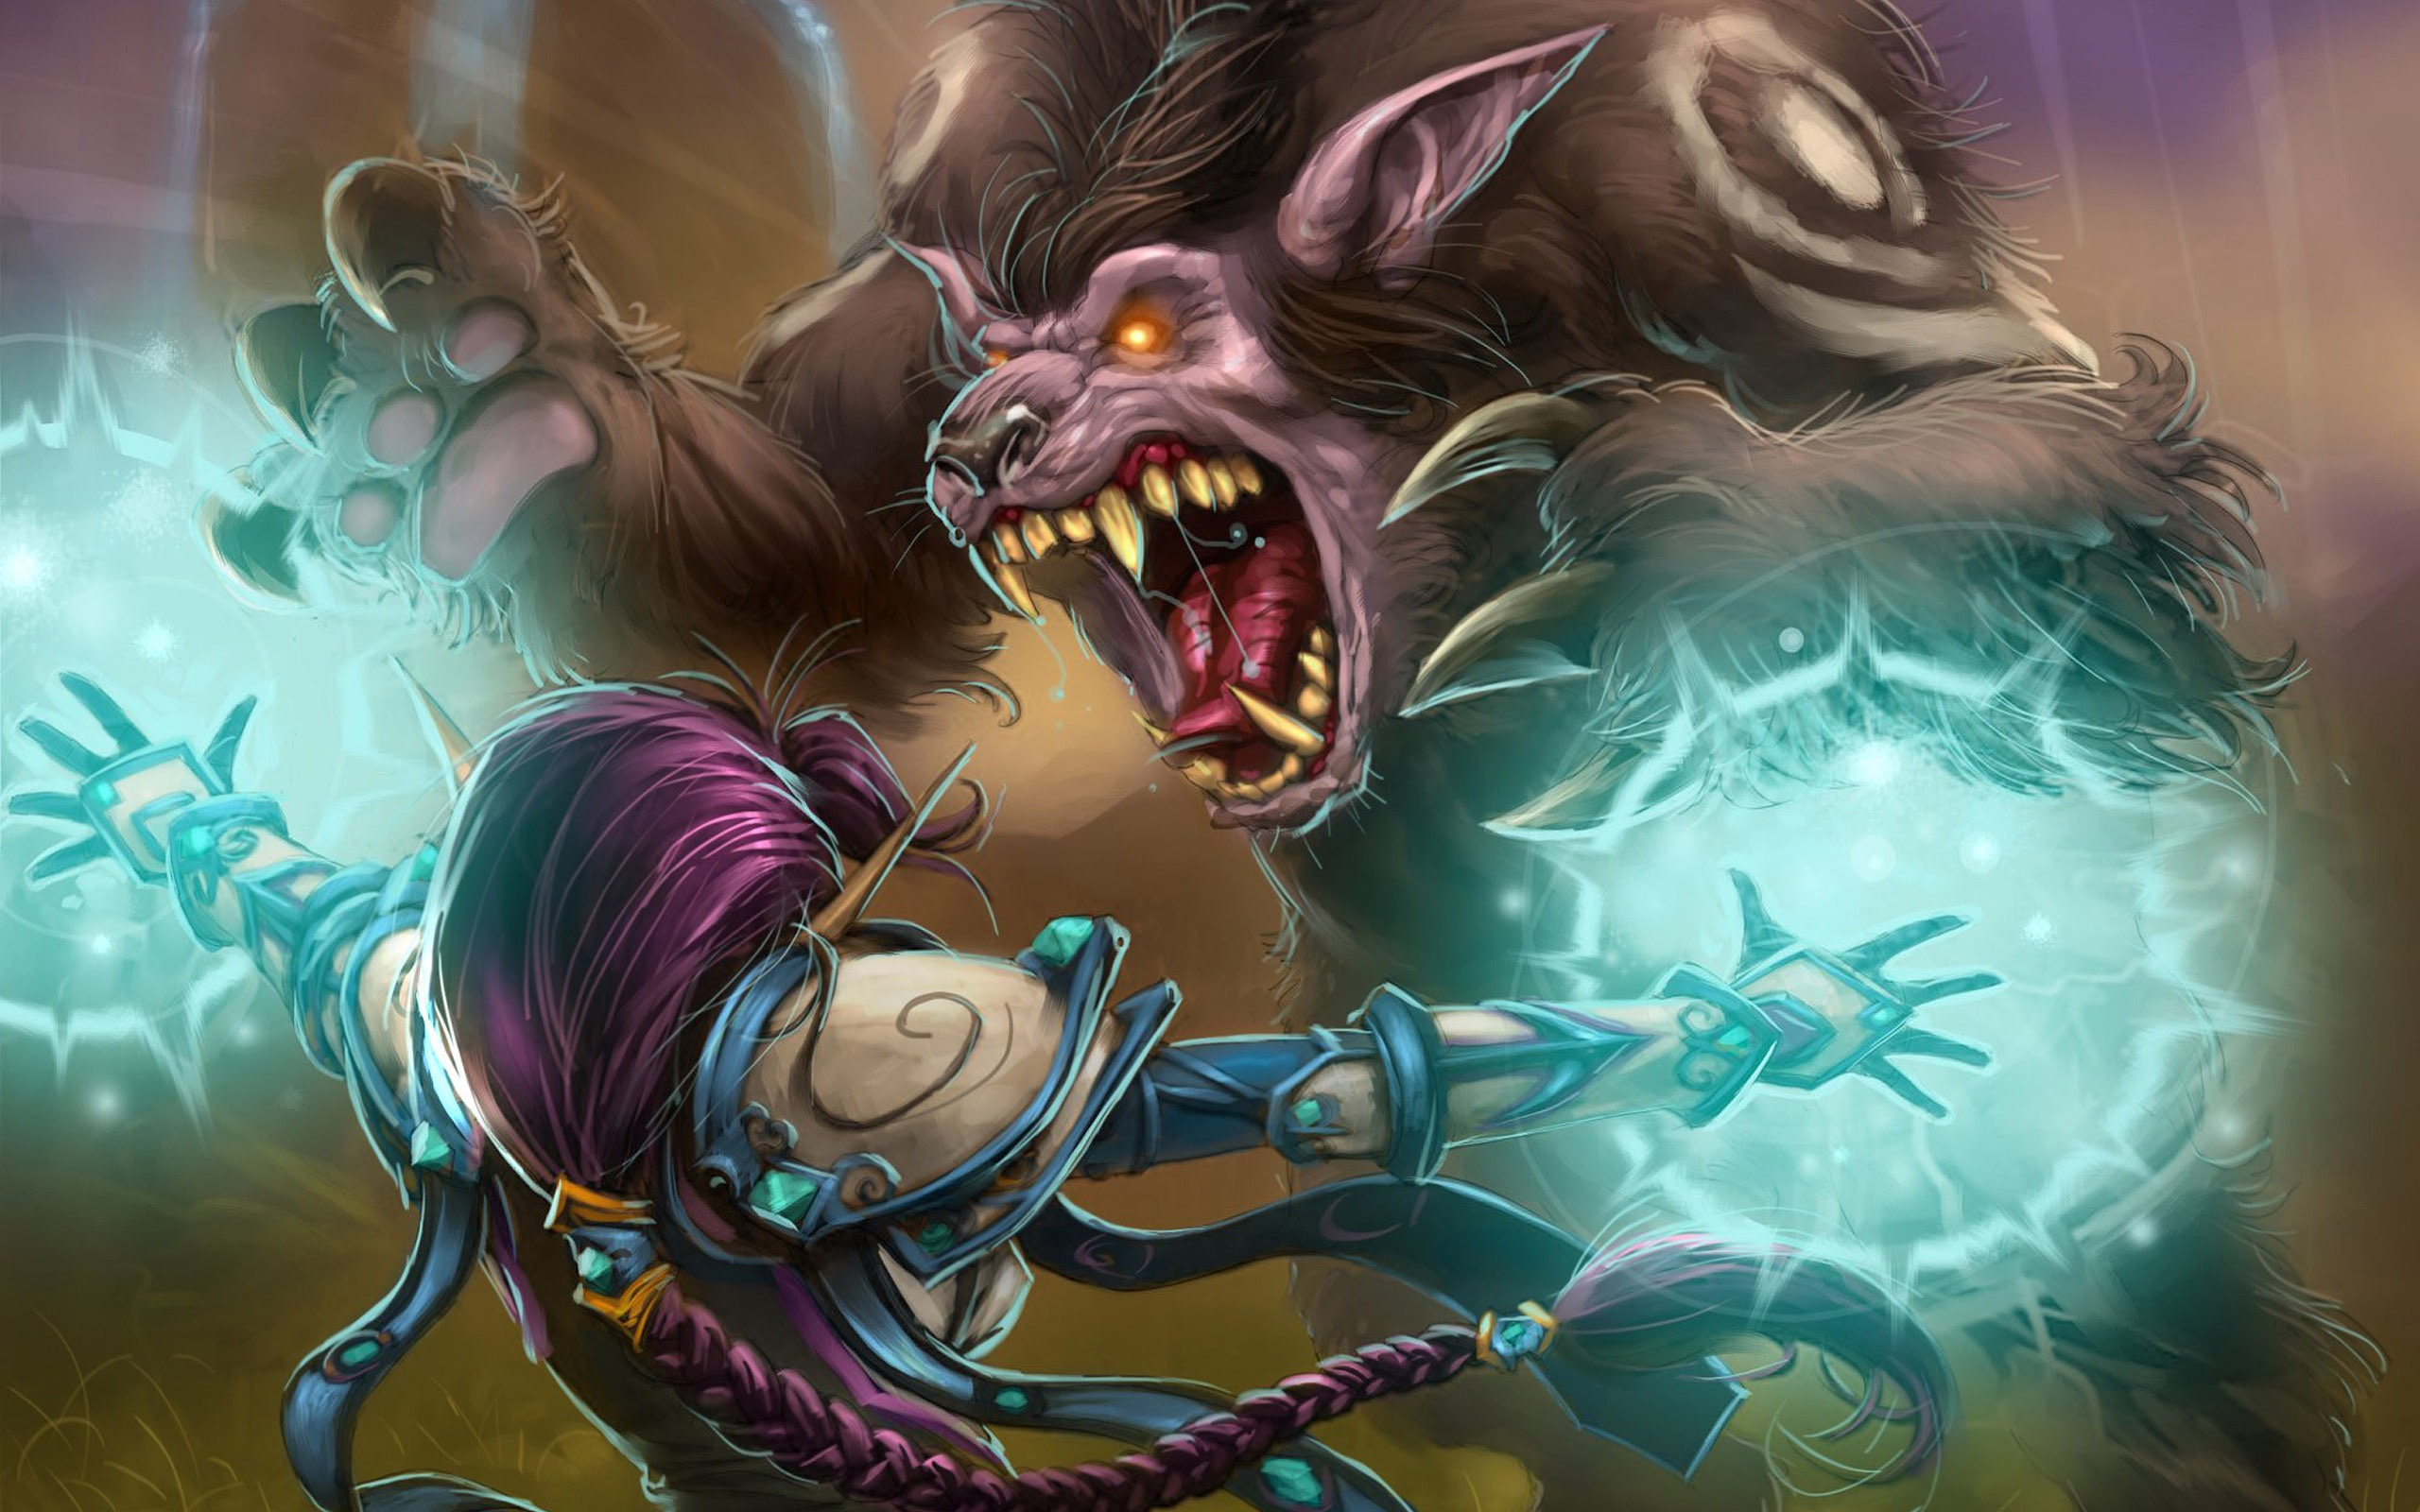 World Of Warcraft Wallpaper Druid - Beast World Of Warcraft , HD Wallpaper & Backgrounds